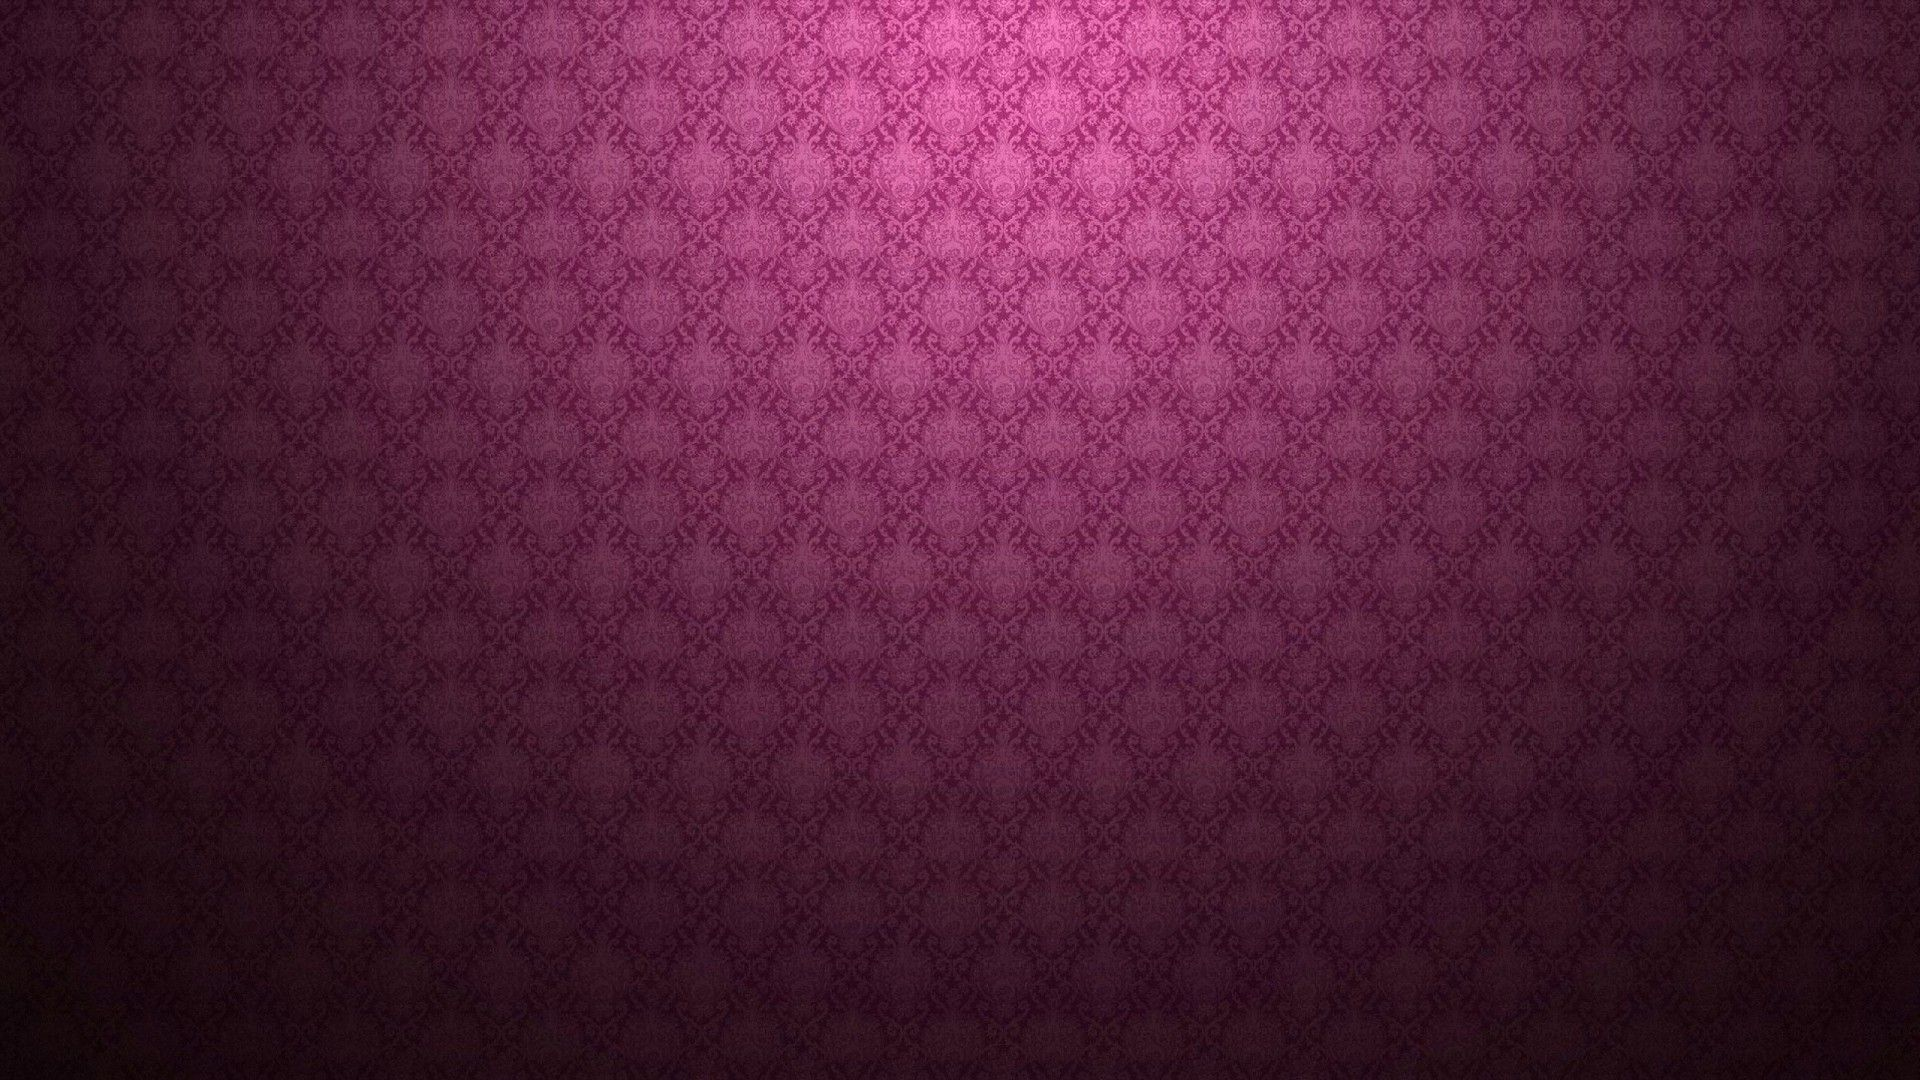 Elegant Nice Wallpaper